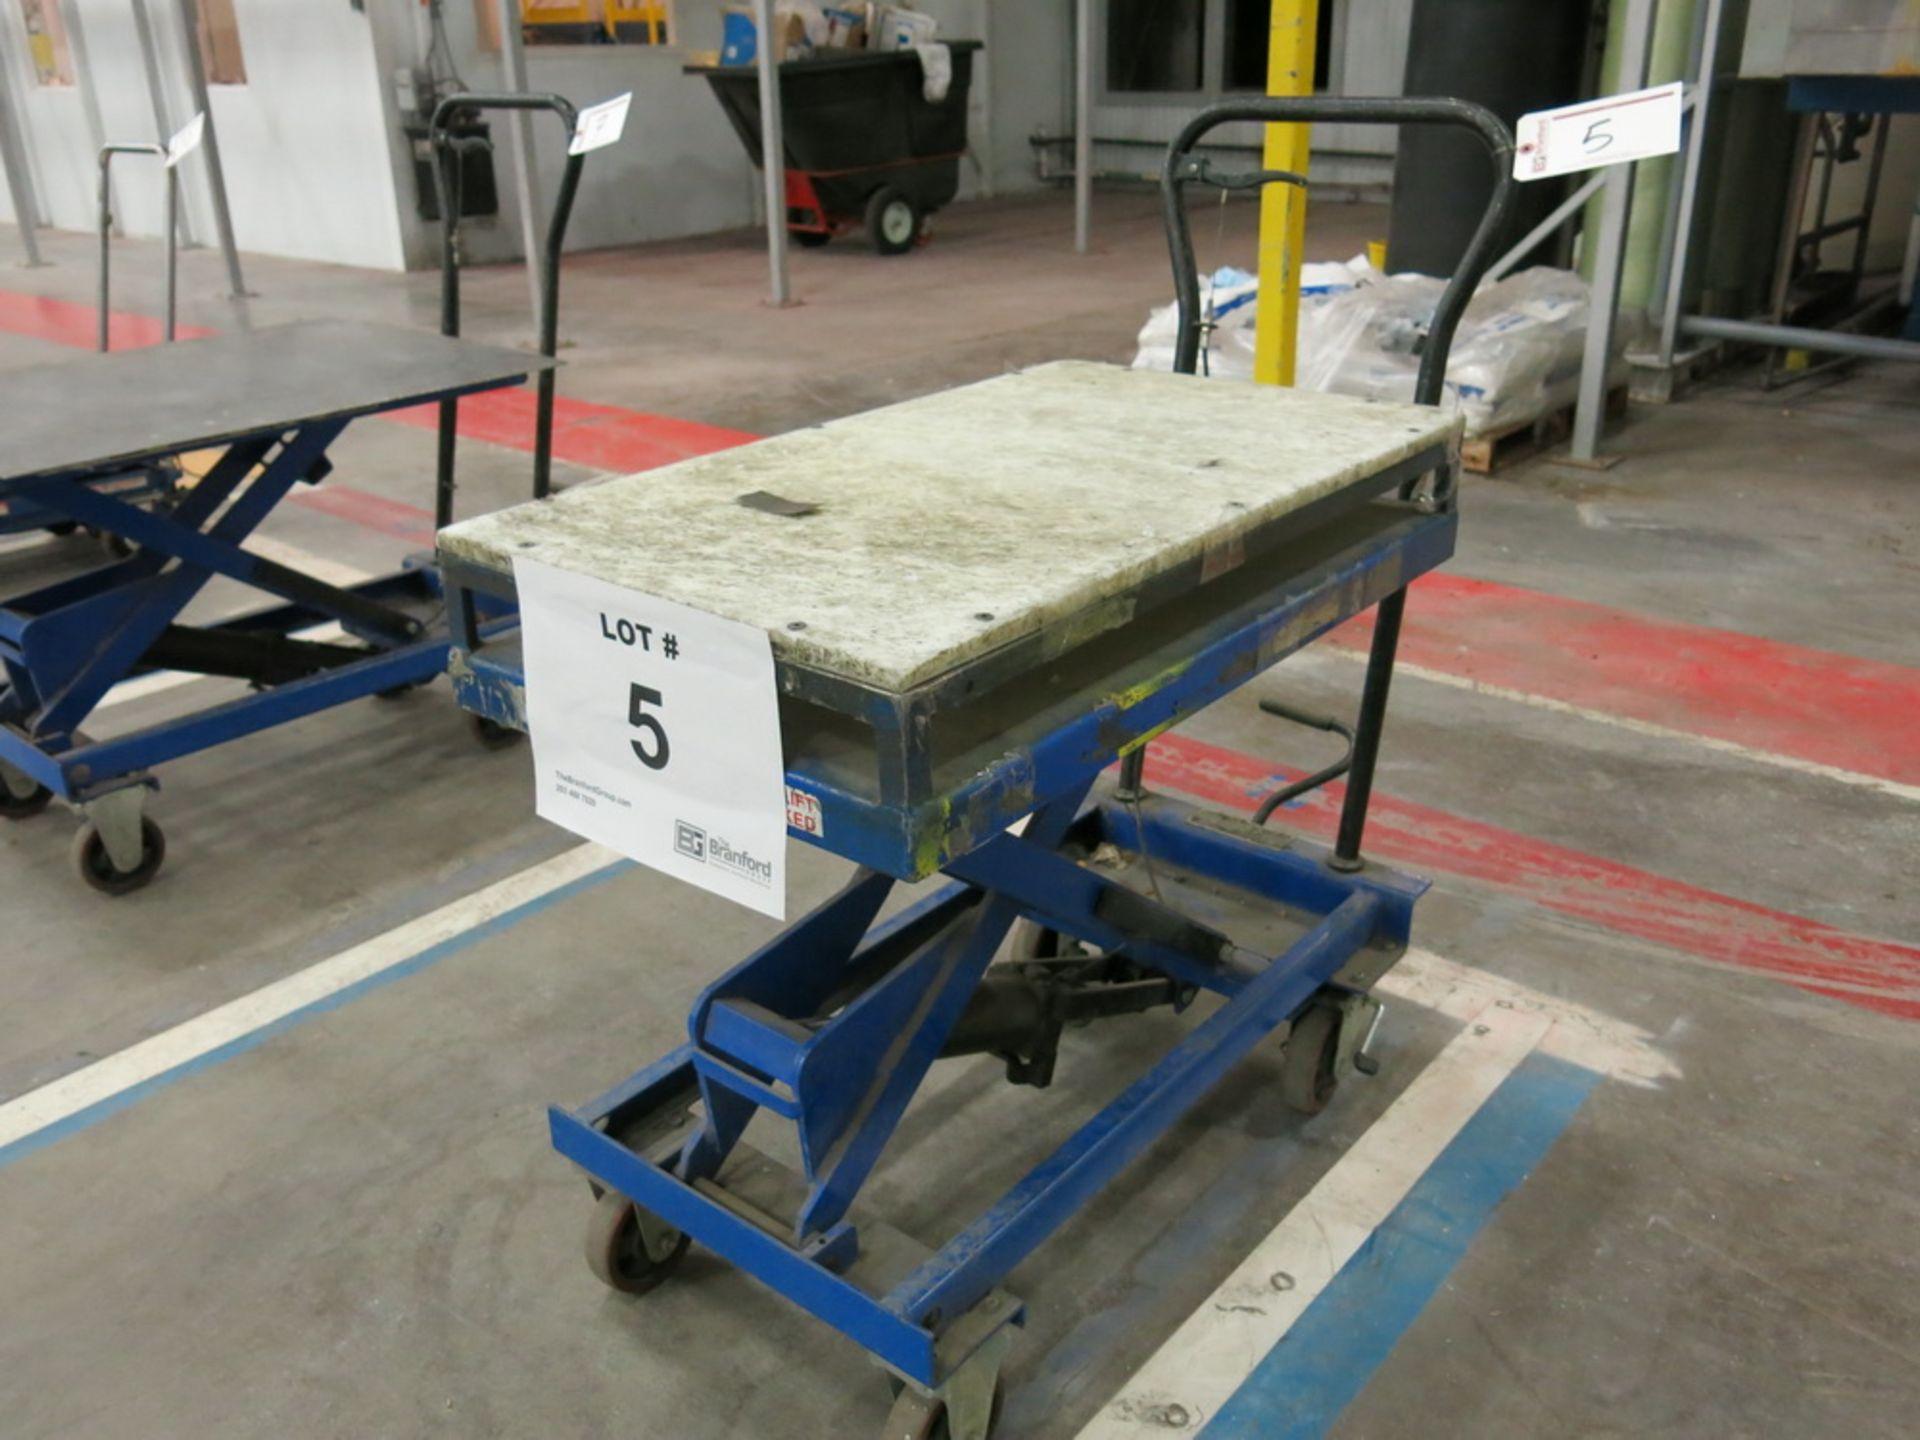 Lot 5 - Lift Table, 1100 lb Cap. Hydraulic Die Lift Cart w/ Polypropylene Top